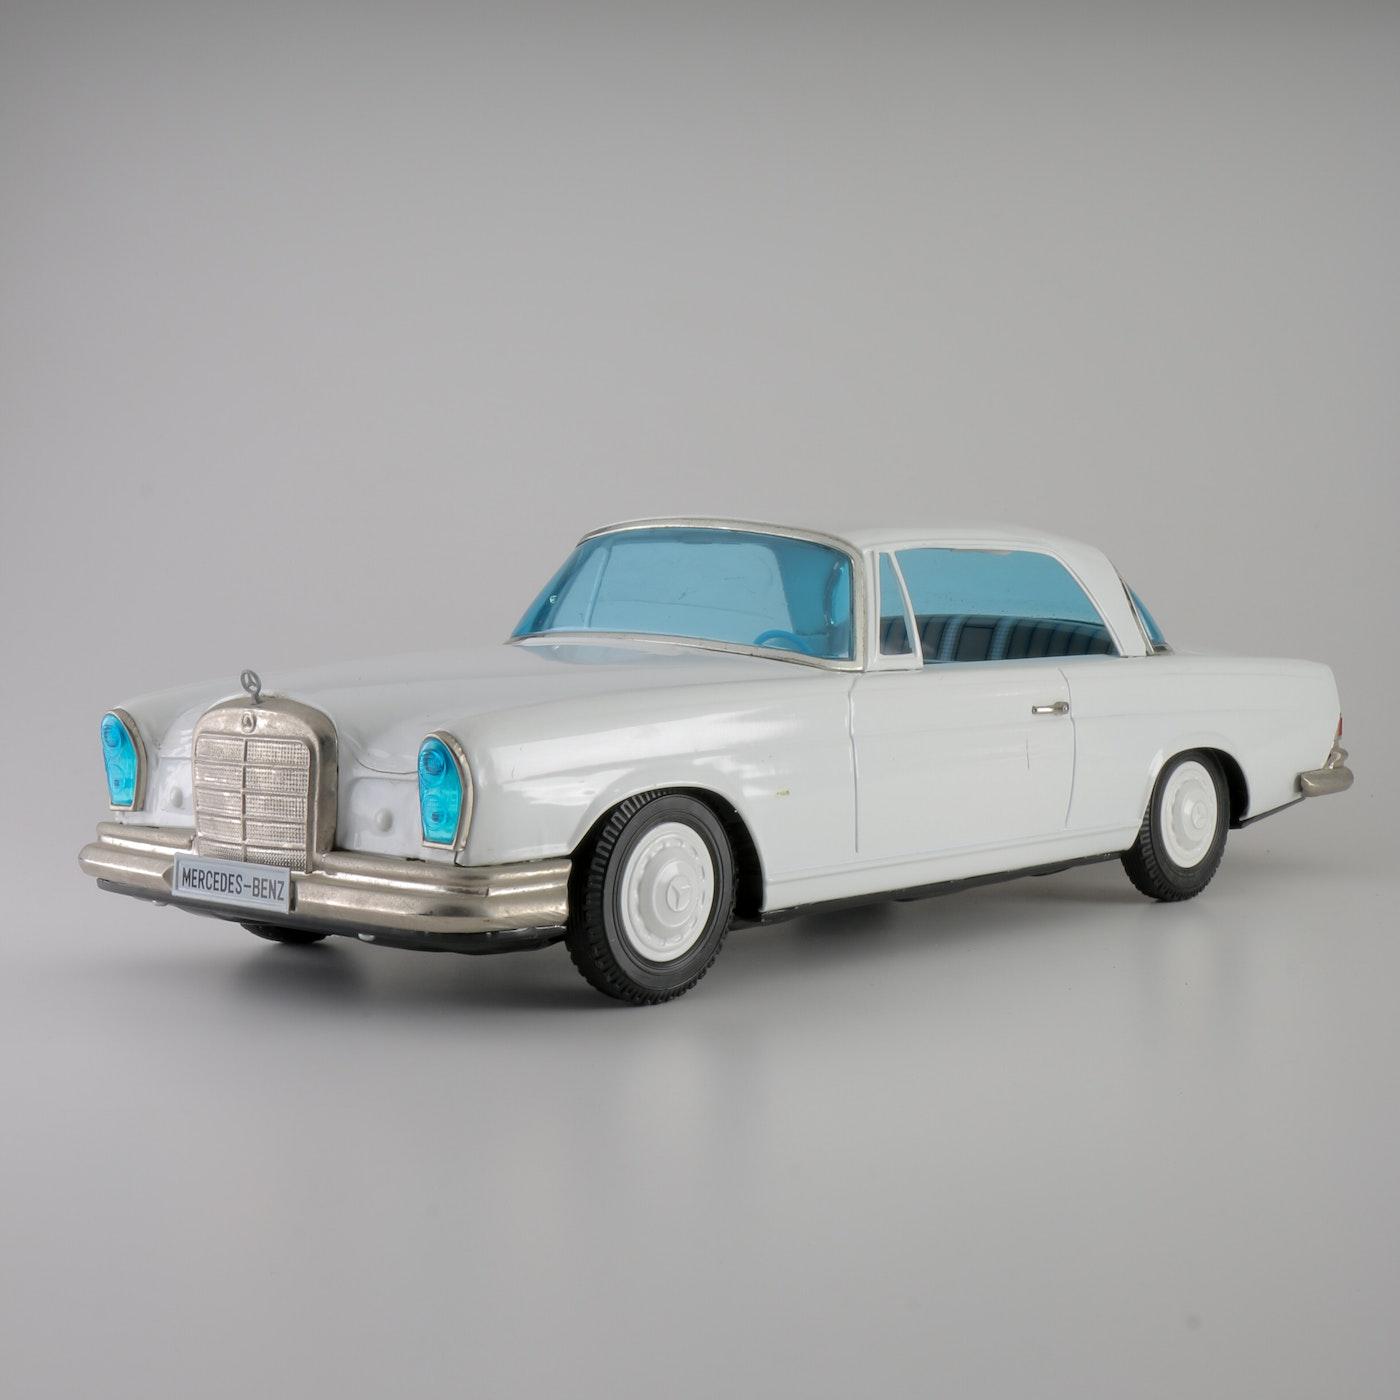 Mercedes benz 230 sl tin friction car ebth for Mercedes benz stuff